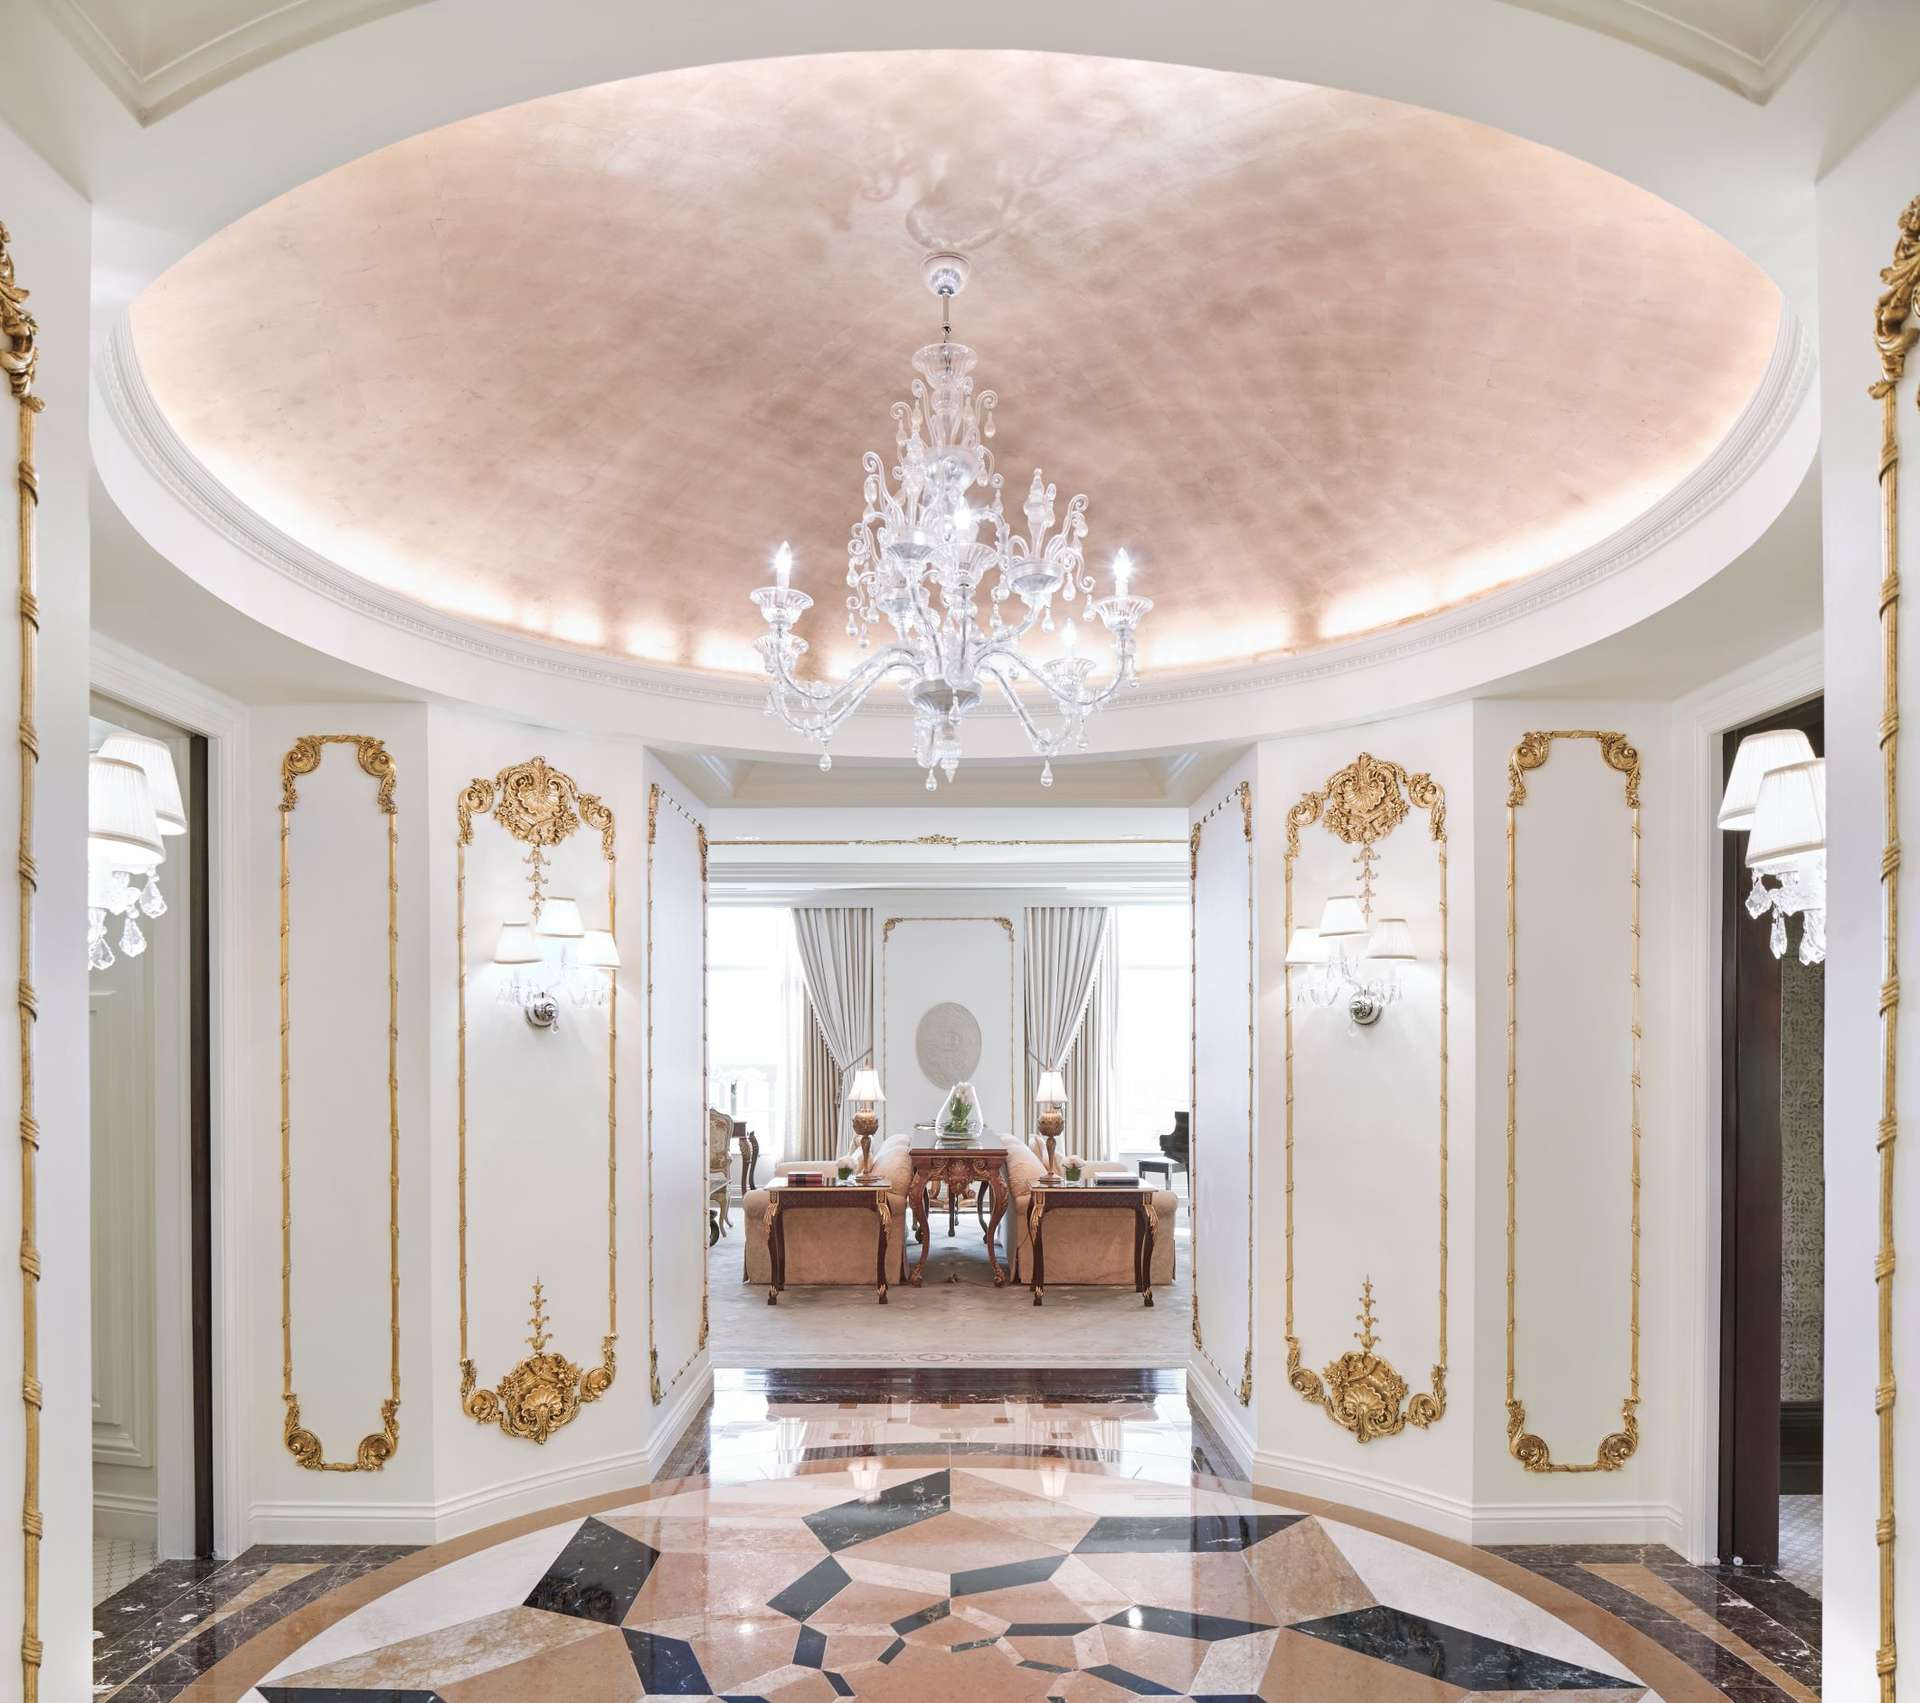 Luxury vacation rentals usa - Nevada - Las vegas - The venetian - Venetian Presidential - Image 1/16